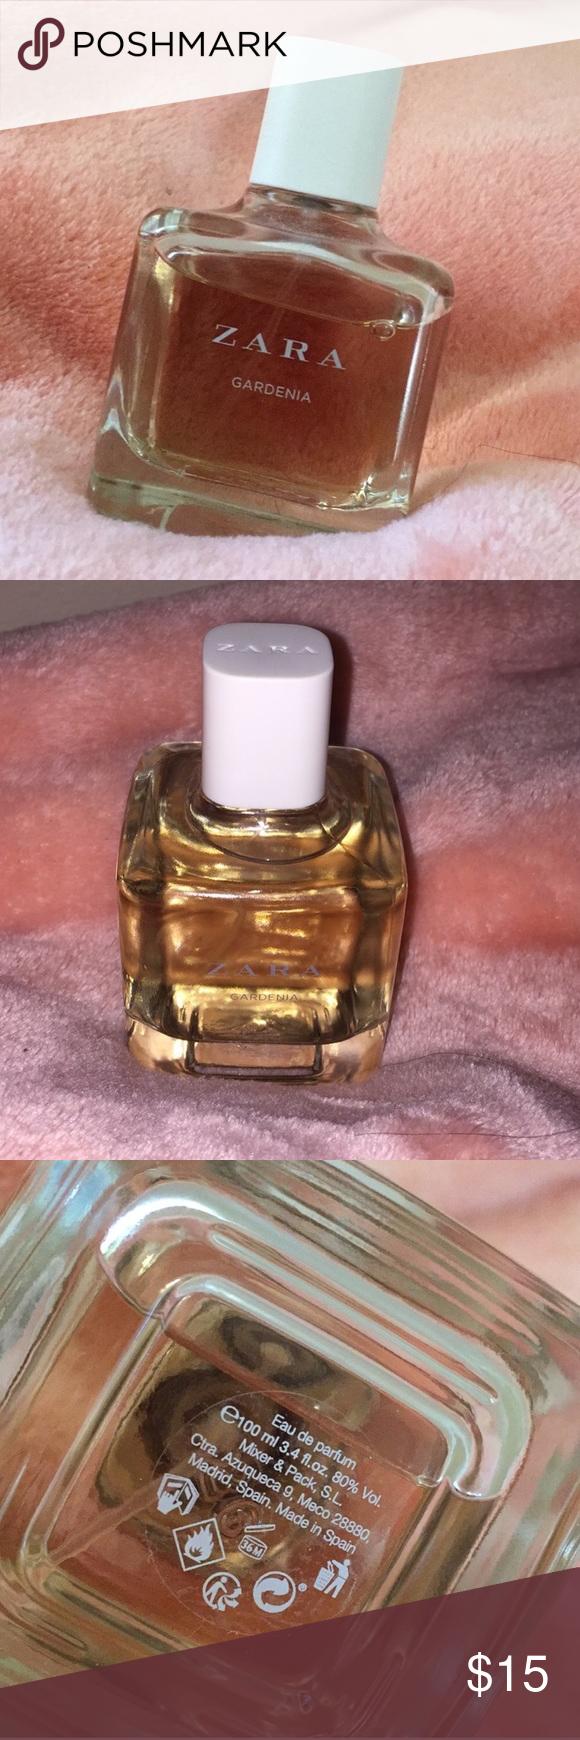 Zara Gardenia Perfume In 2018 My Posh Picks Pinterest Gardenia